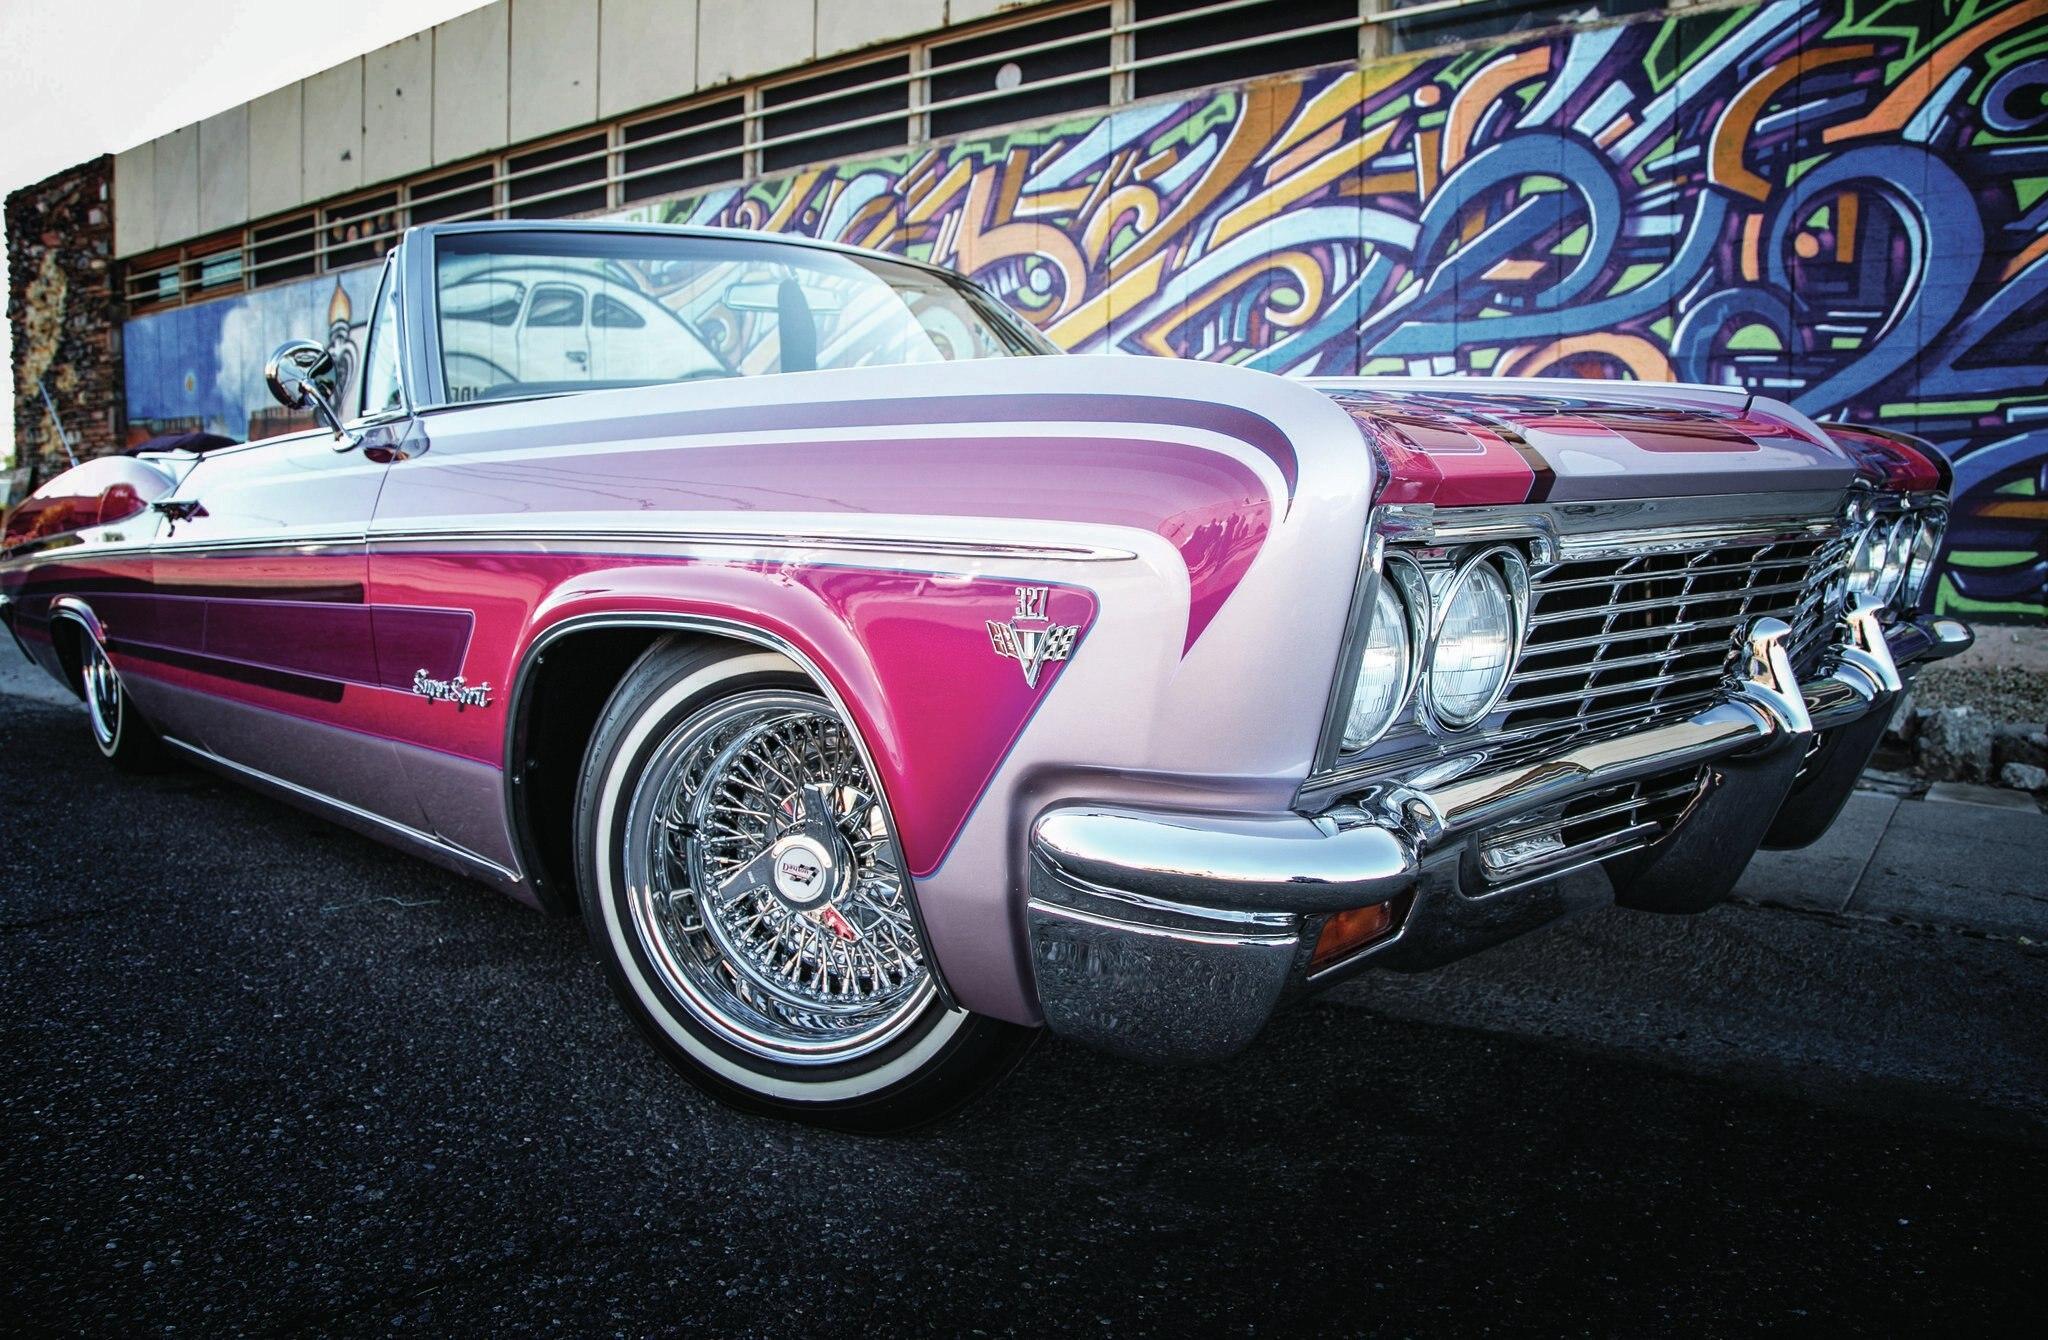 66 Impala 4 Door Lowrider